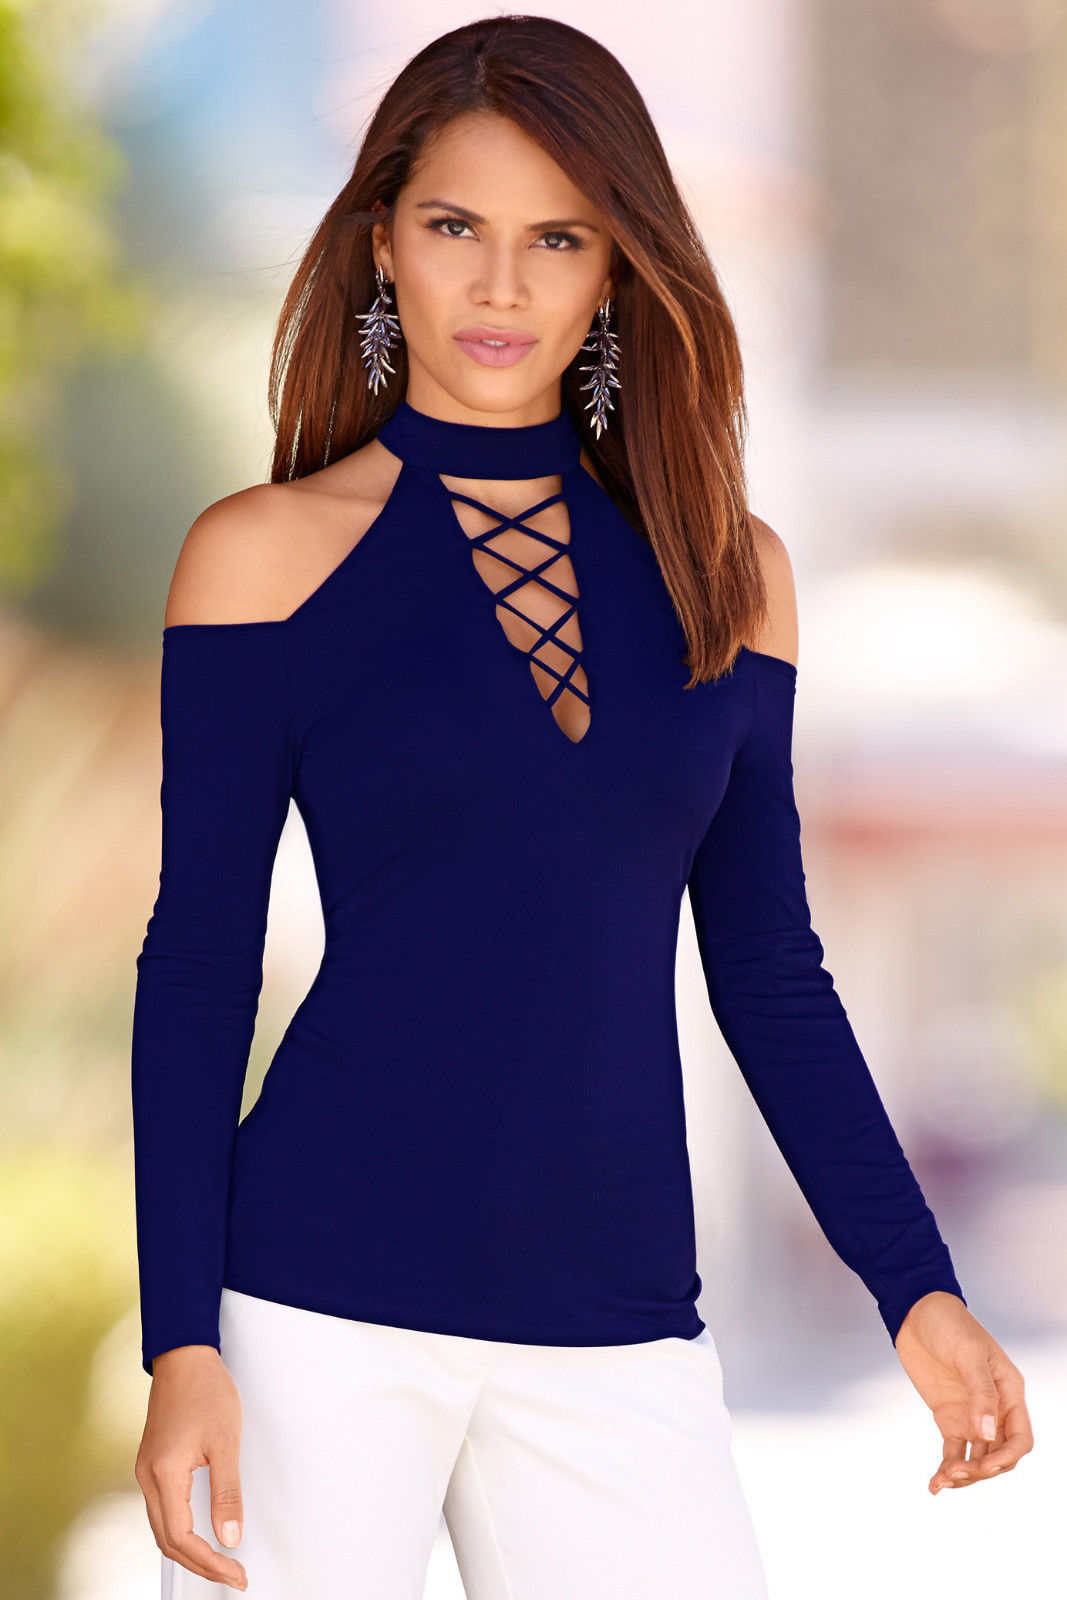 Aliexpress.com : Buy Women Tops 2017 New Year Long Sleeve